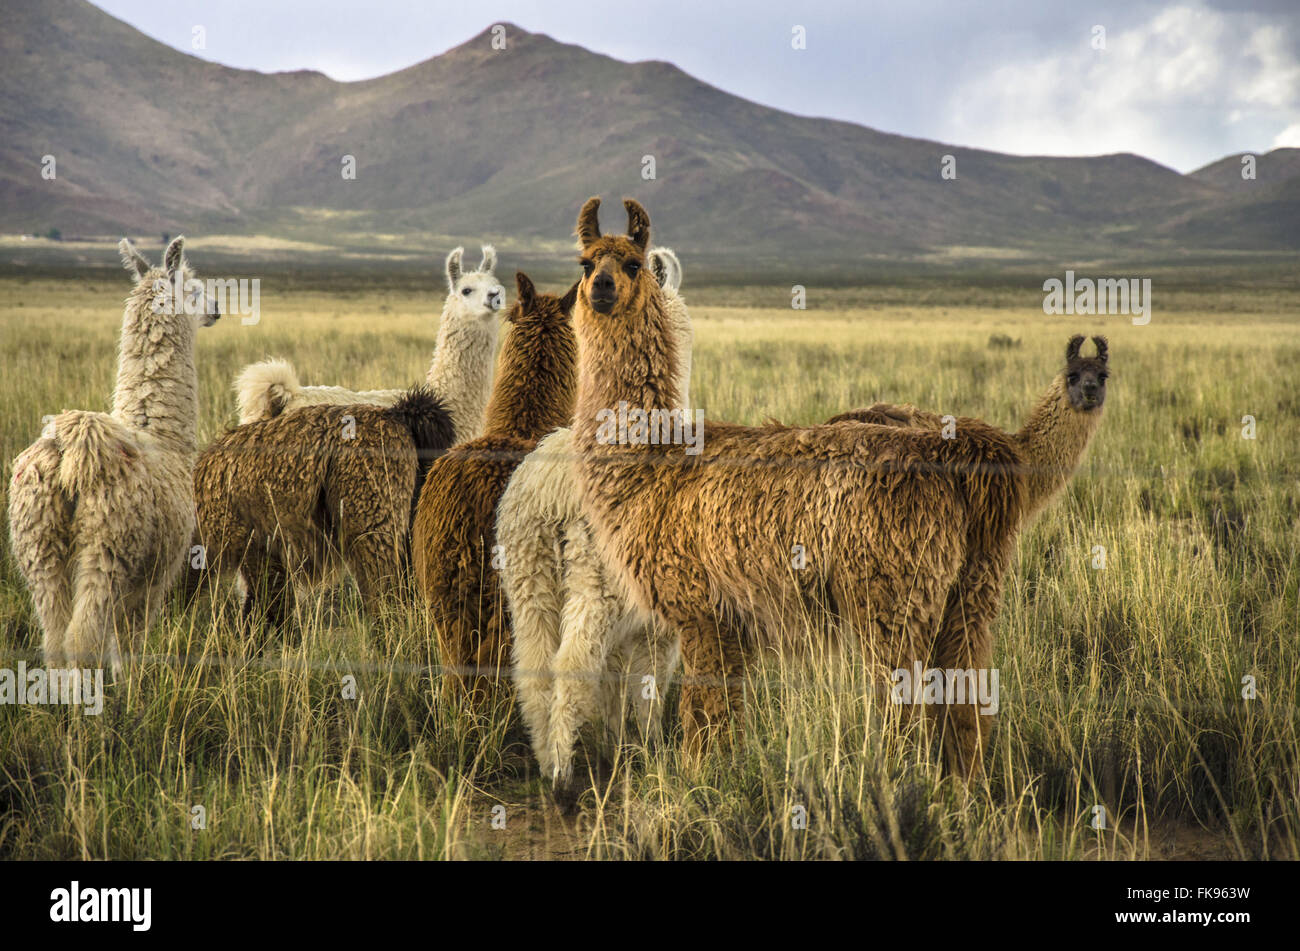 Lamas im Feld in der Nähe von der Ruta Nacional 40, Provincia de Jujuy Stockbild